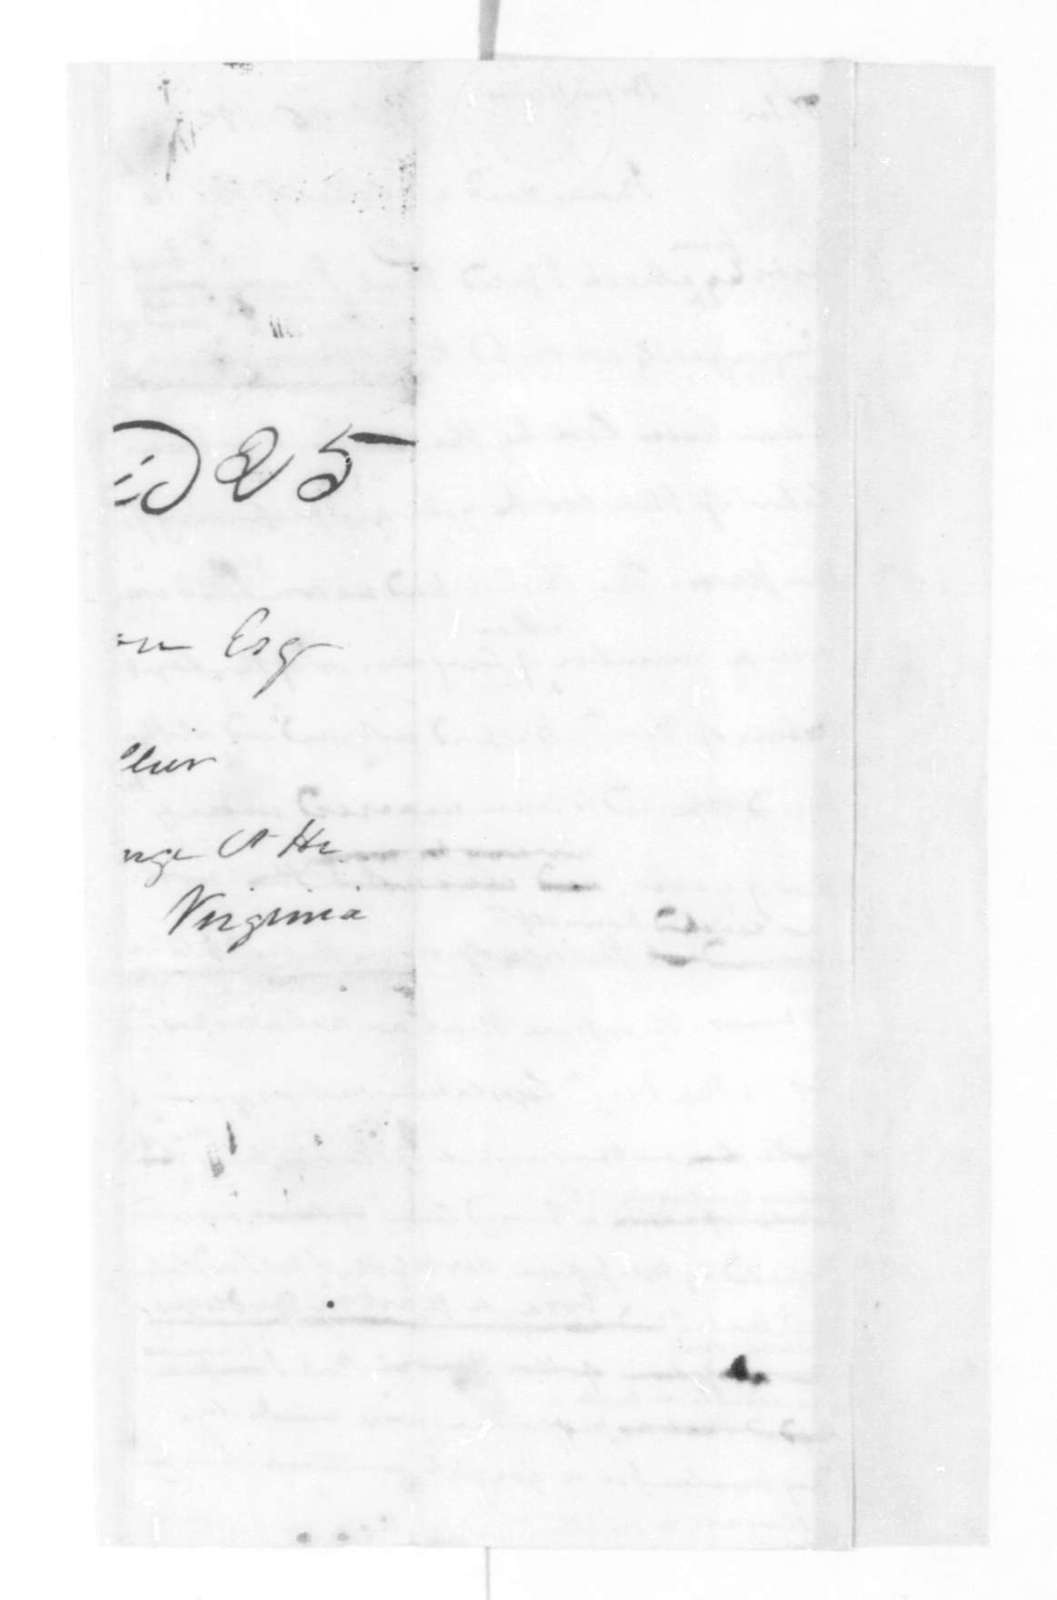 James Madison to John Brennan, September 26, 1825.